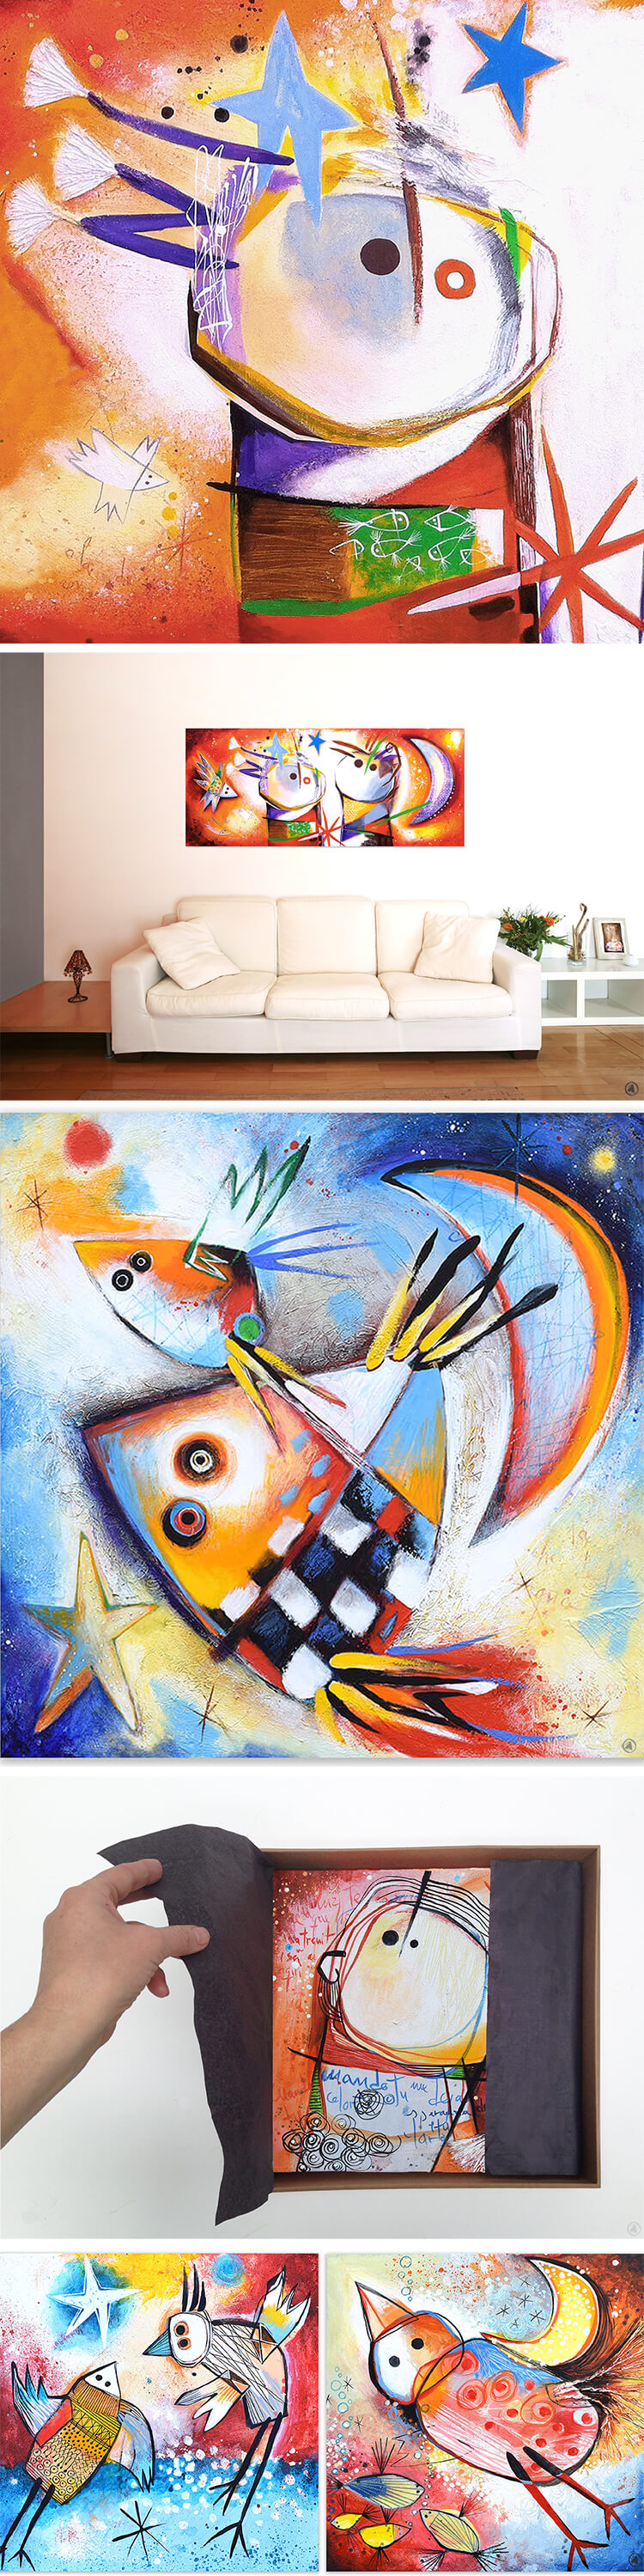 Art by Angeles Nieto